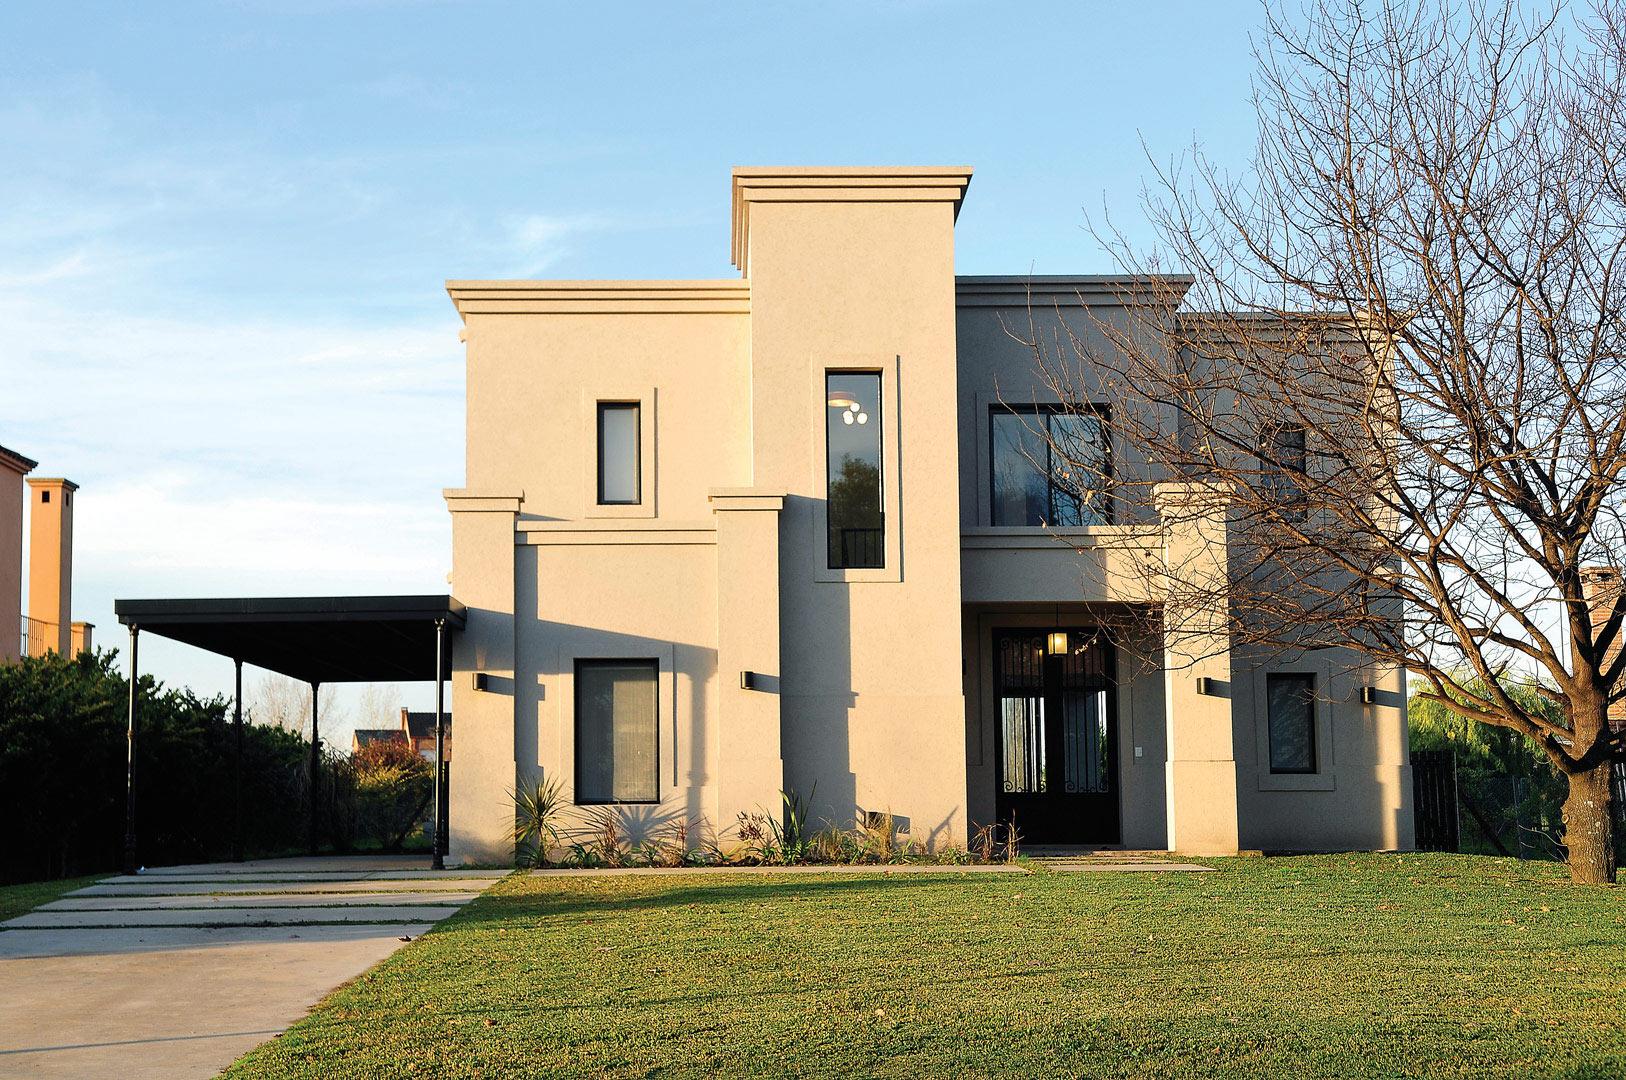 Marcela parrado arquitectura casa estilo actual - Fachadas arquitectura ...